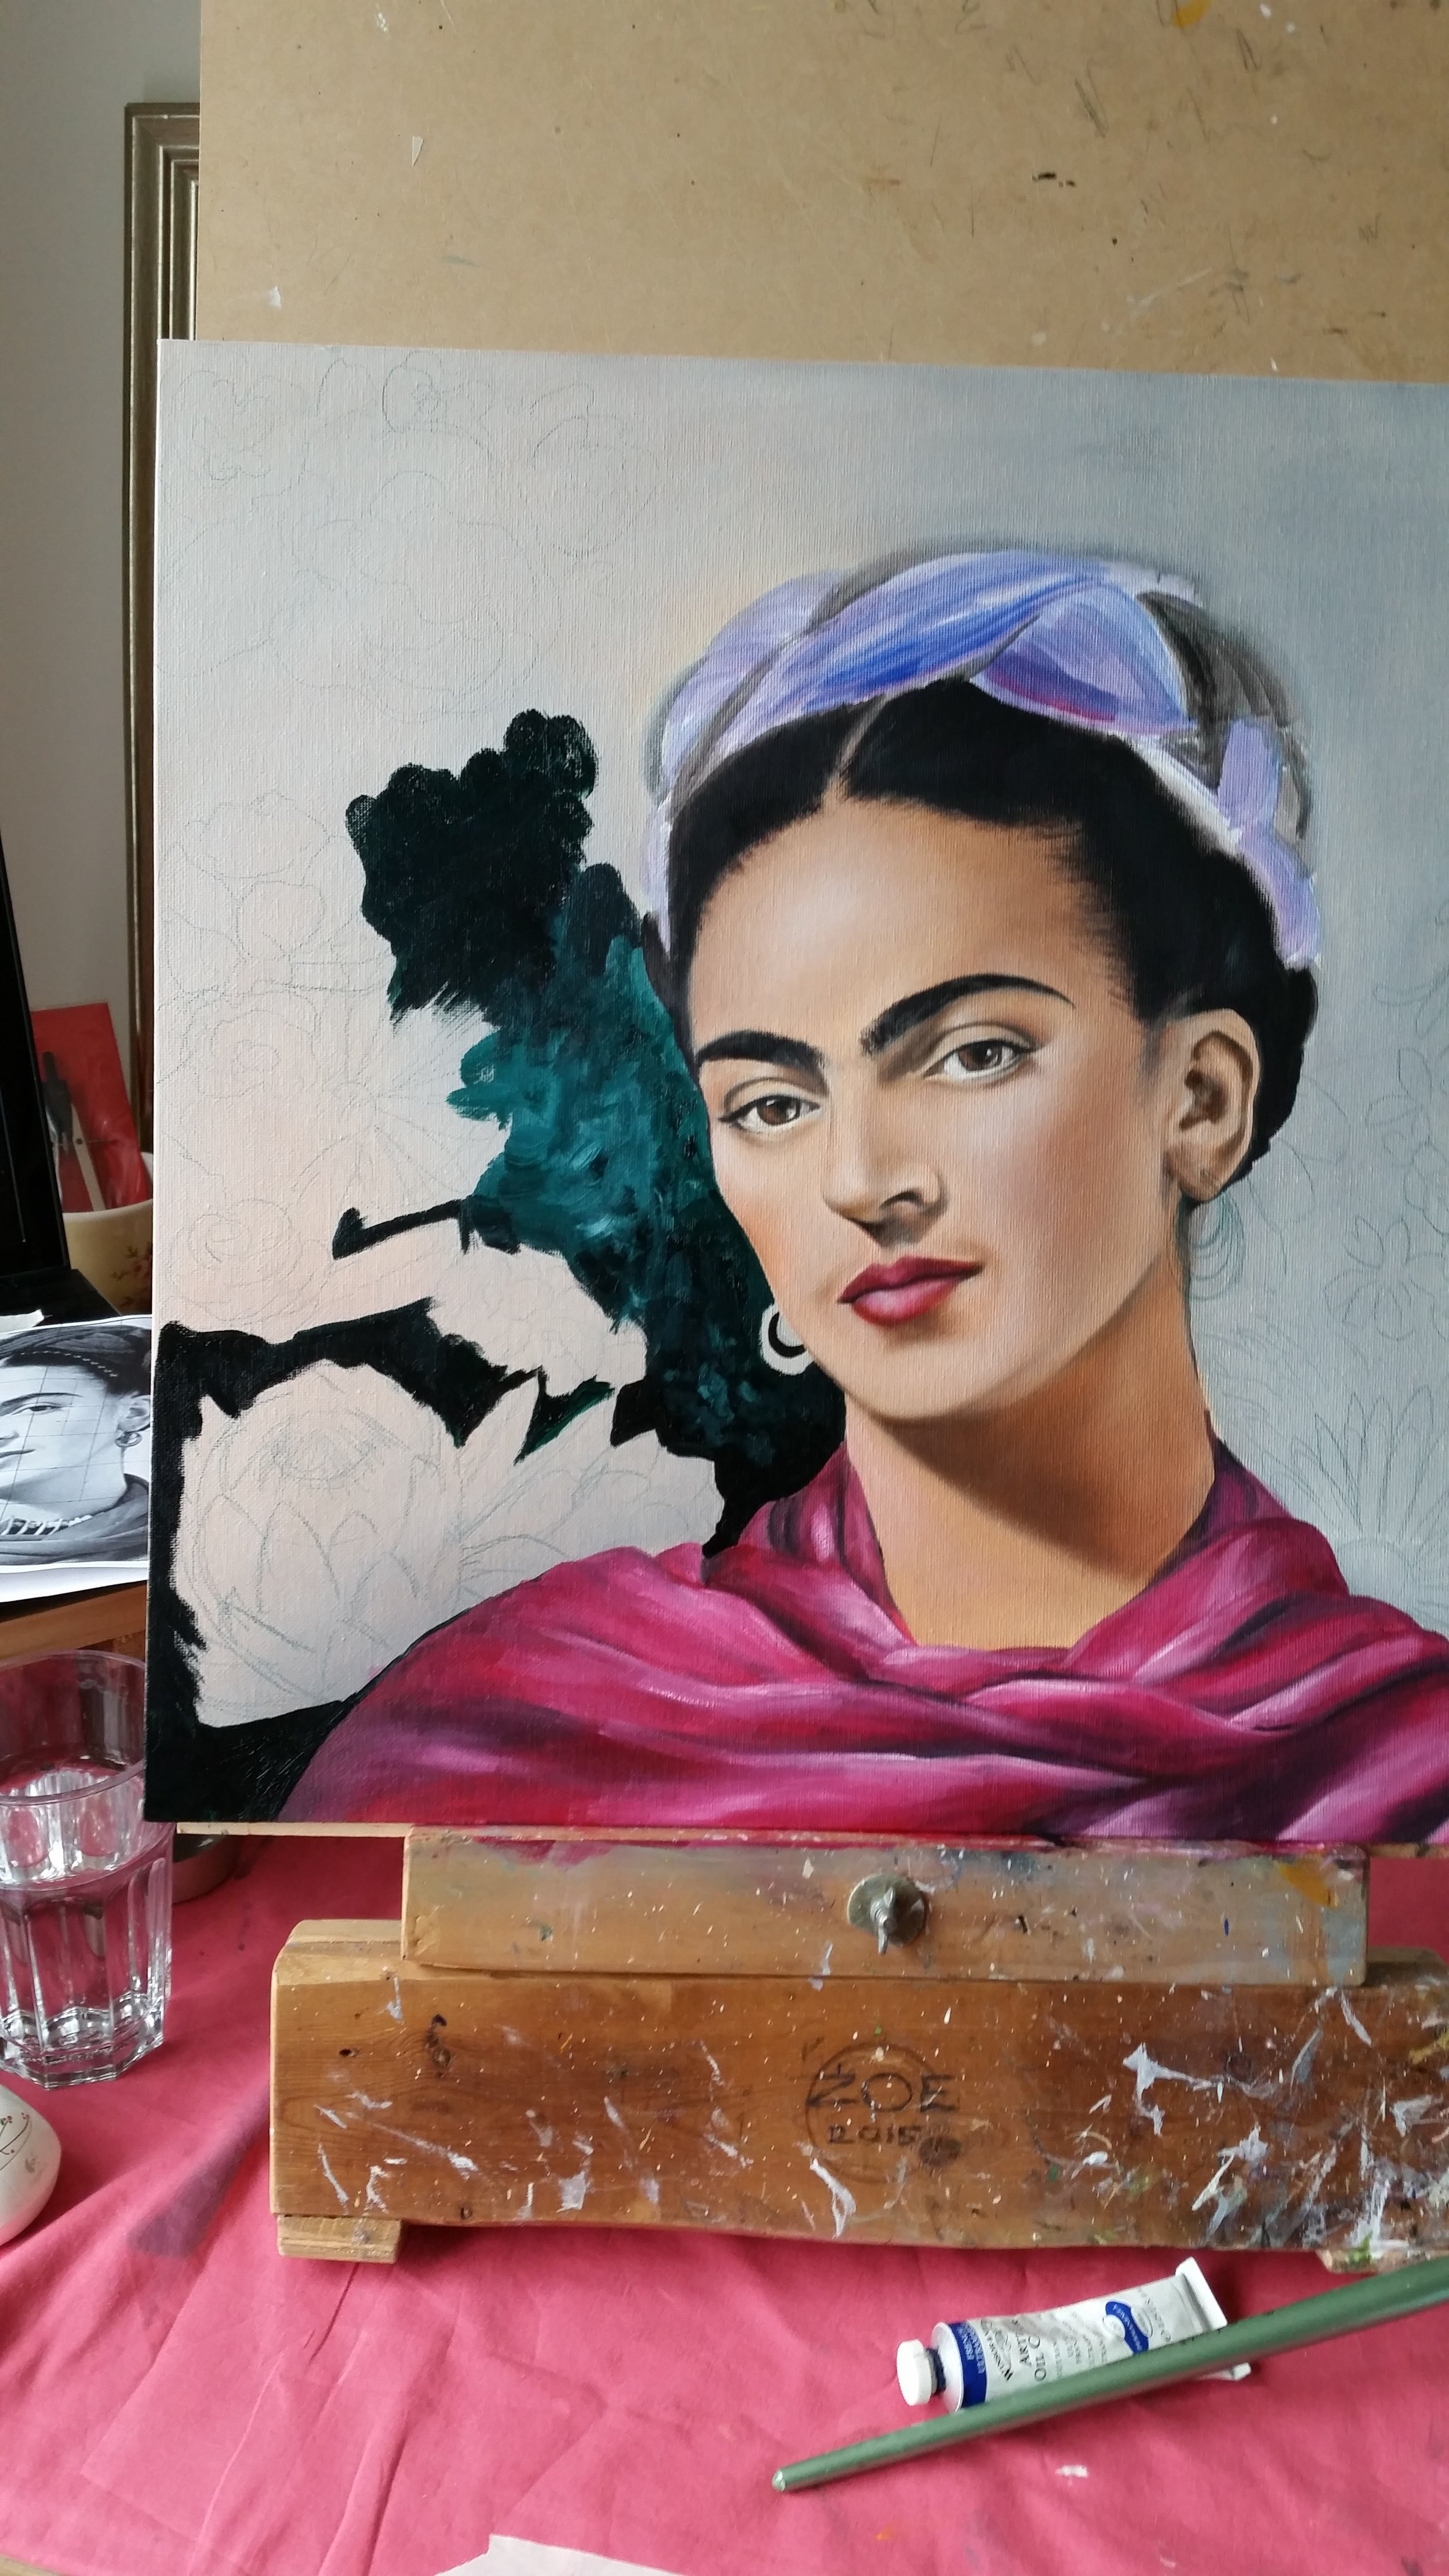 Adding flowers - oil Frida painting - Zoe Wood 2017